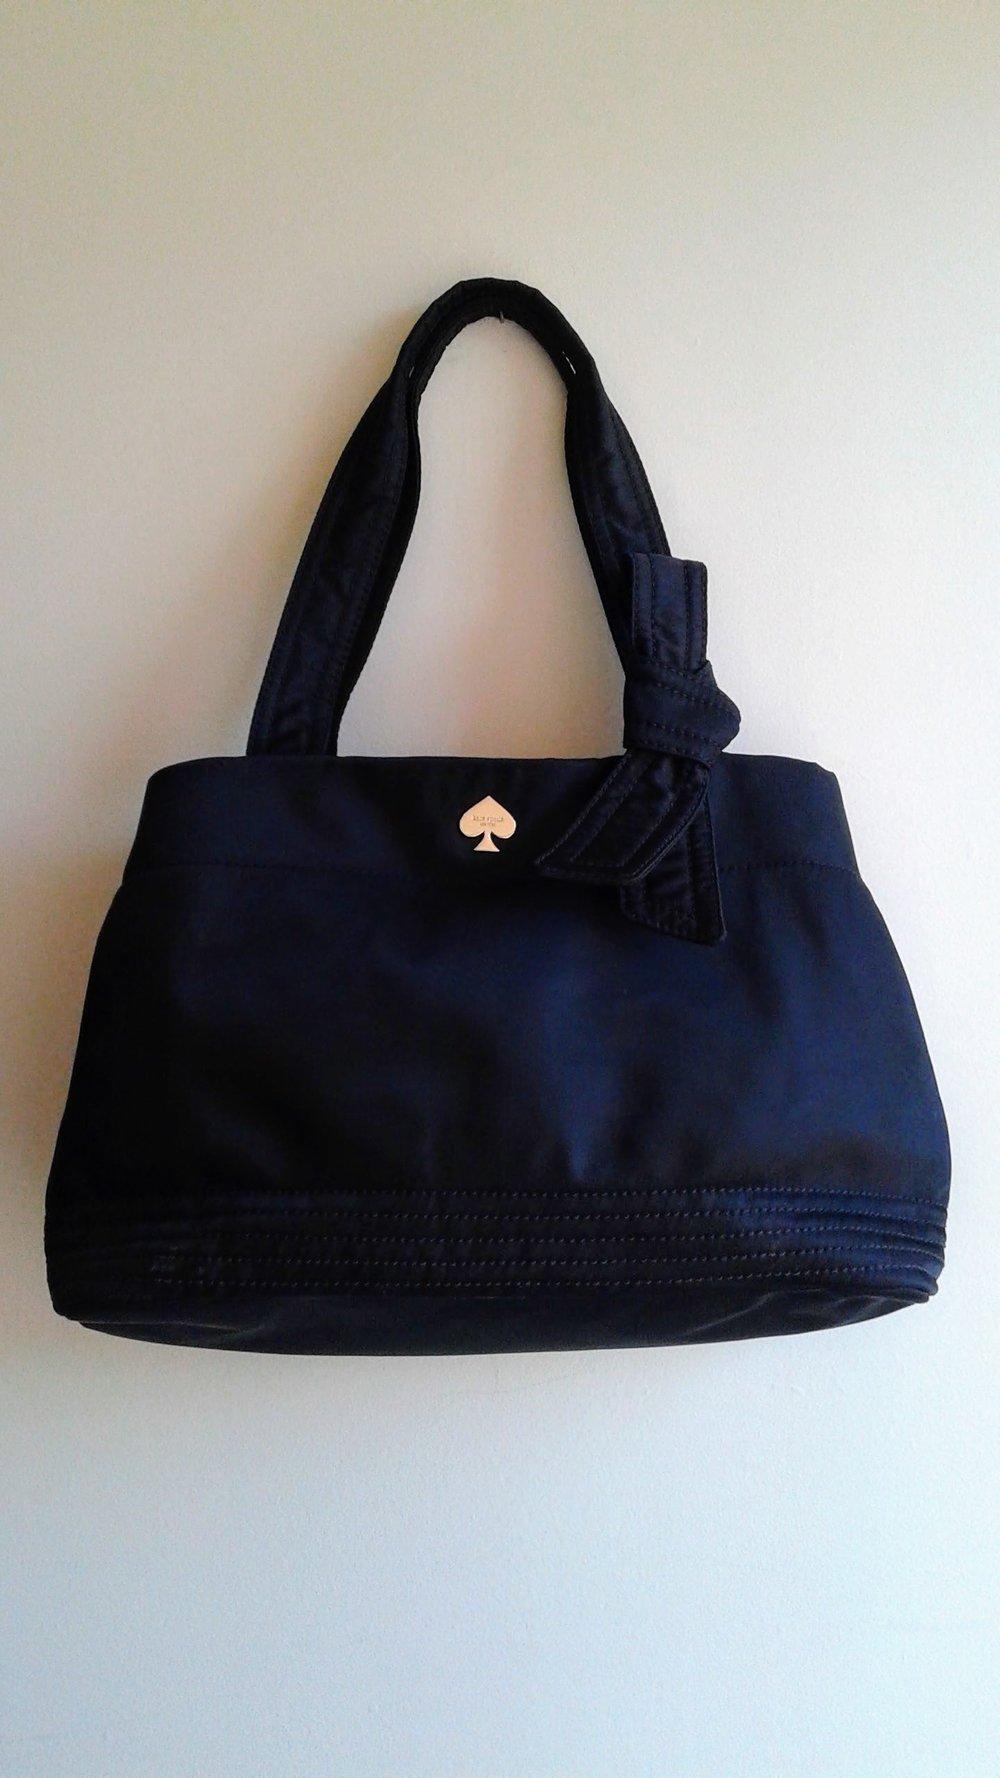 Kate Spade purse, $62